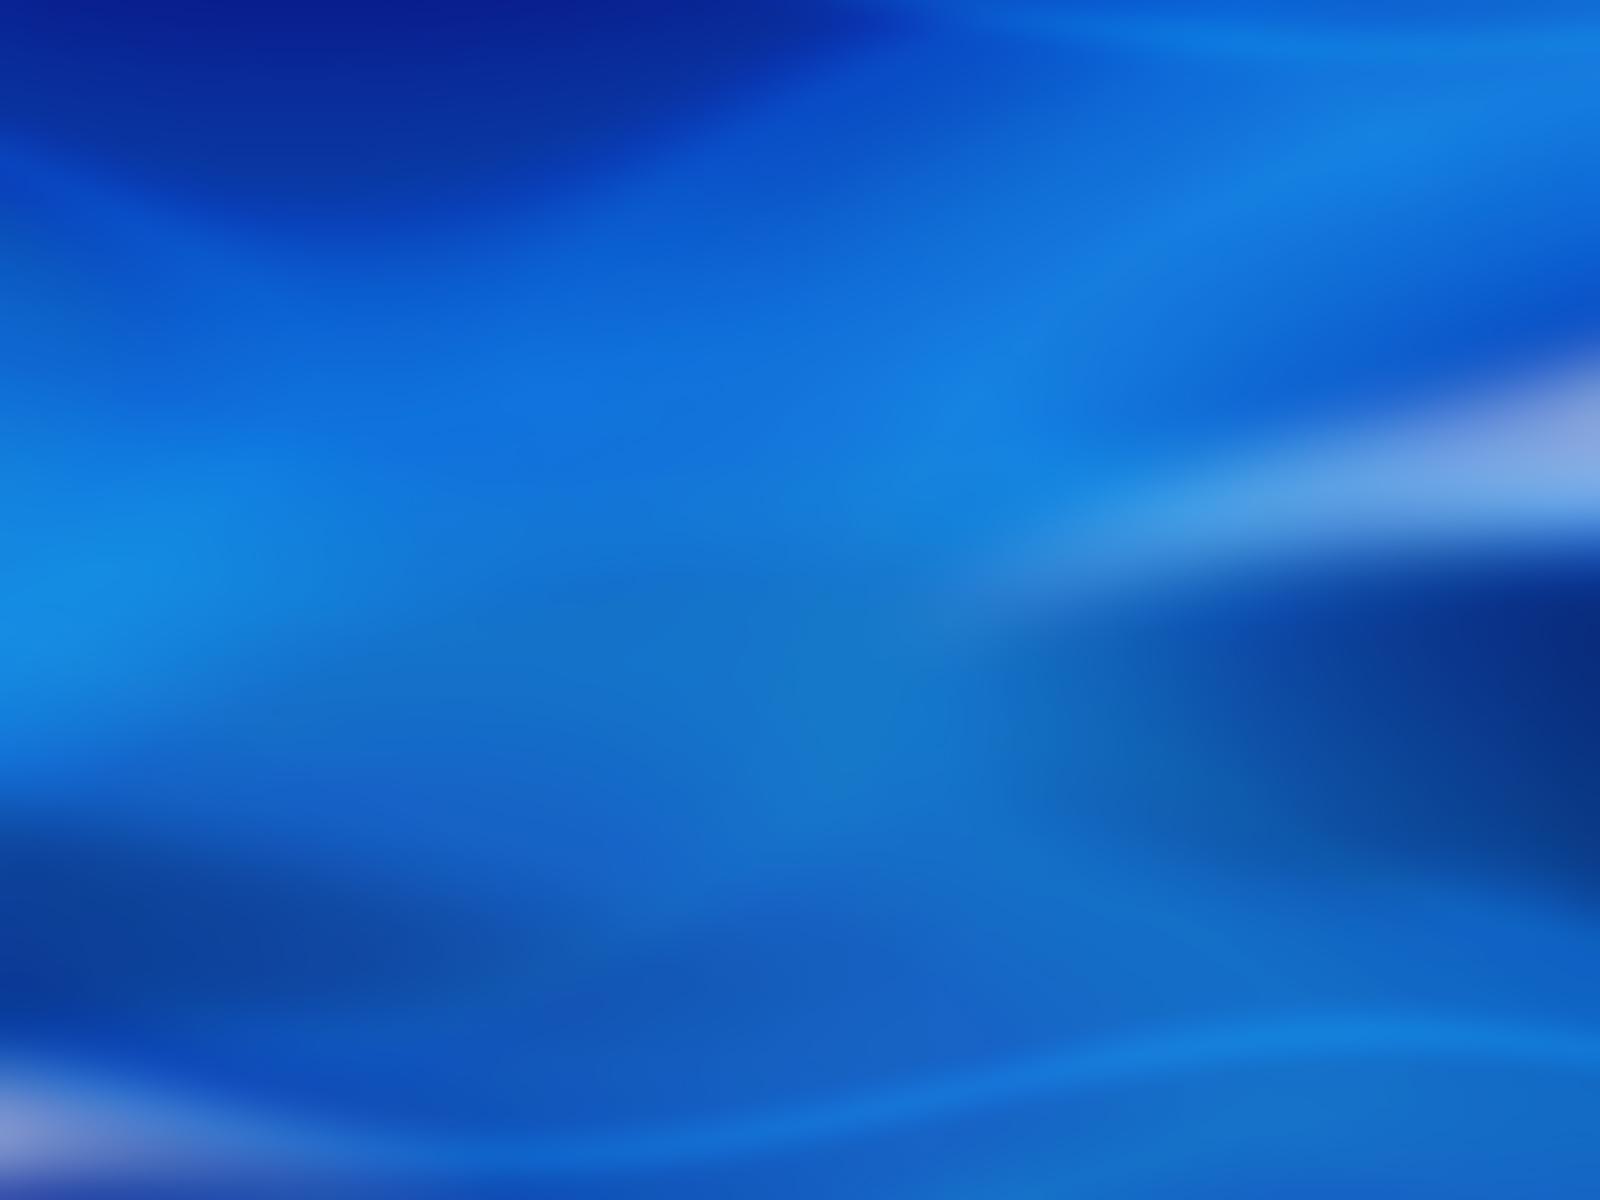 Background image center - Jpg 1600x1200 Windows Media Center Background